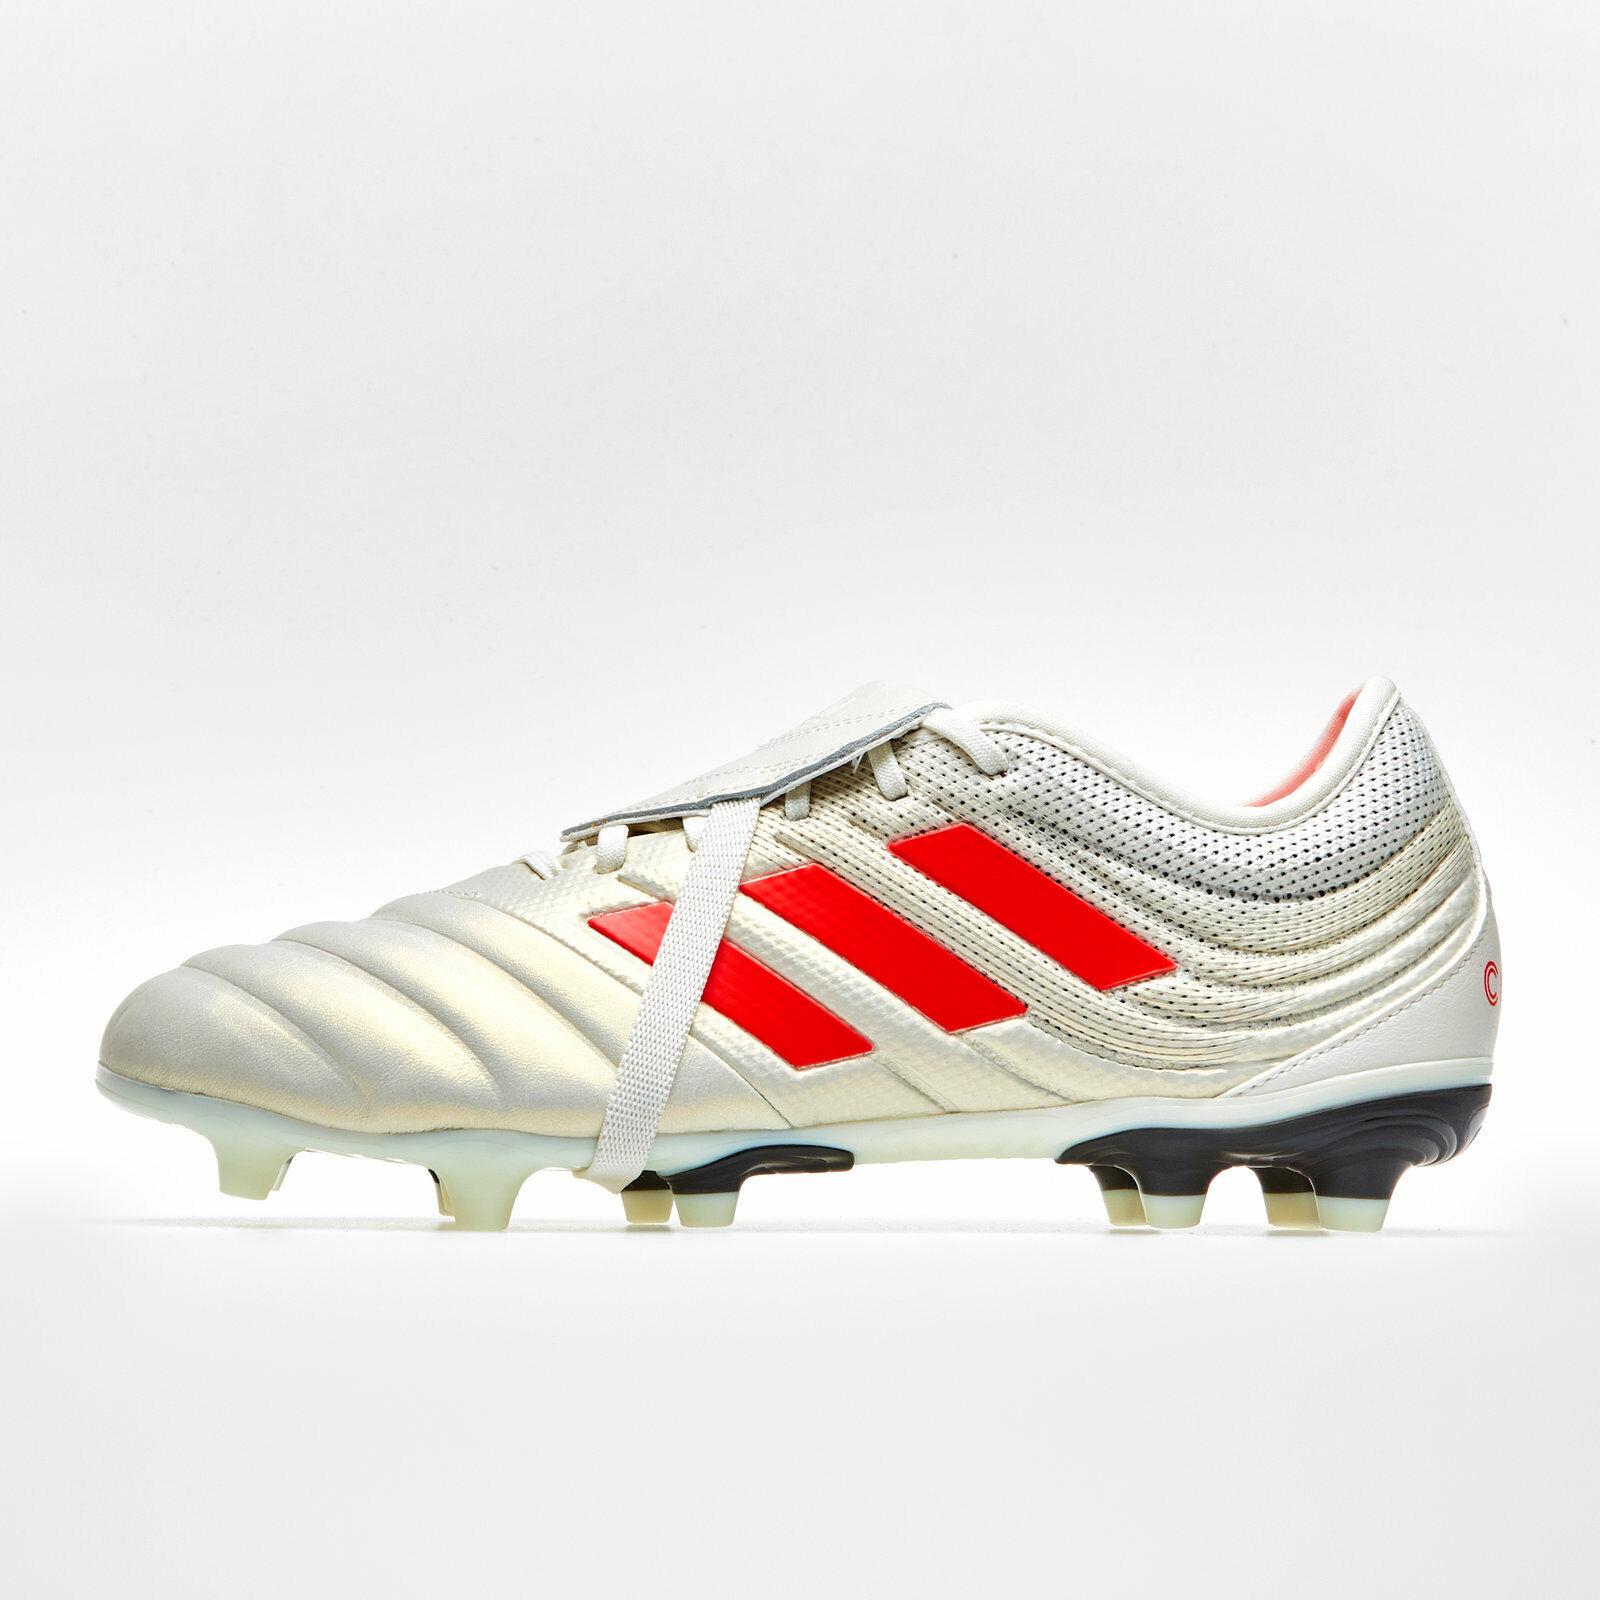 Adidas Pour des hommes Copa Glor 19.2 FG Football bottes Studs Trainers Sports chaussures blanc